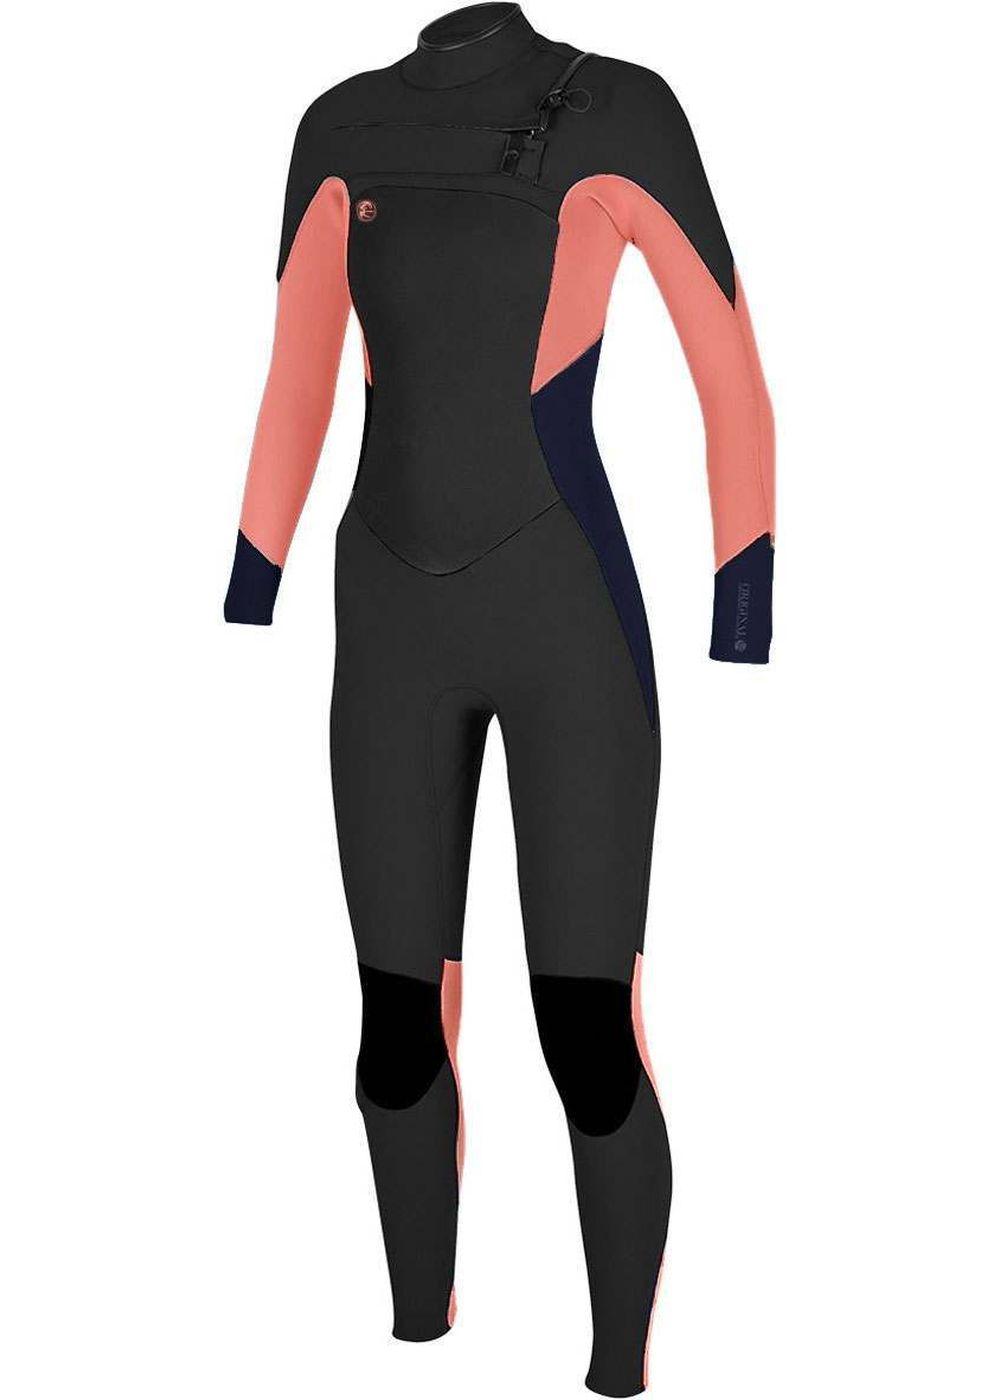 Oneill Womens Original Fz 5/4 Wetsuit 18 Blk/slt Picture